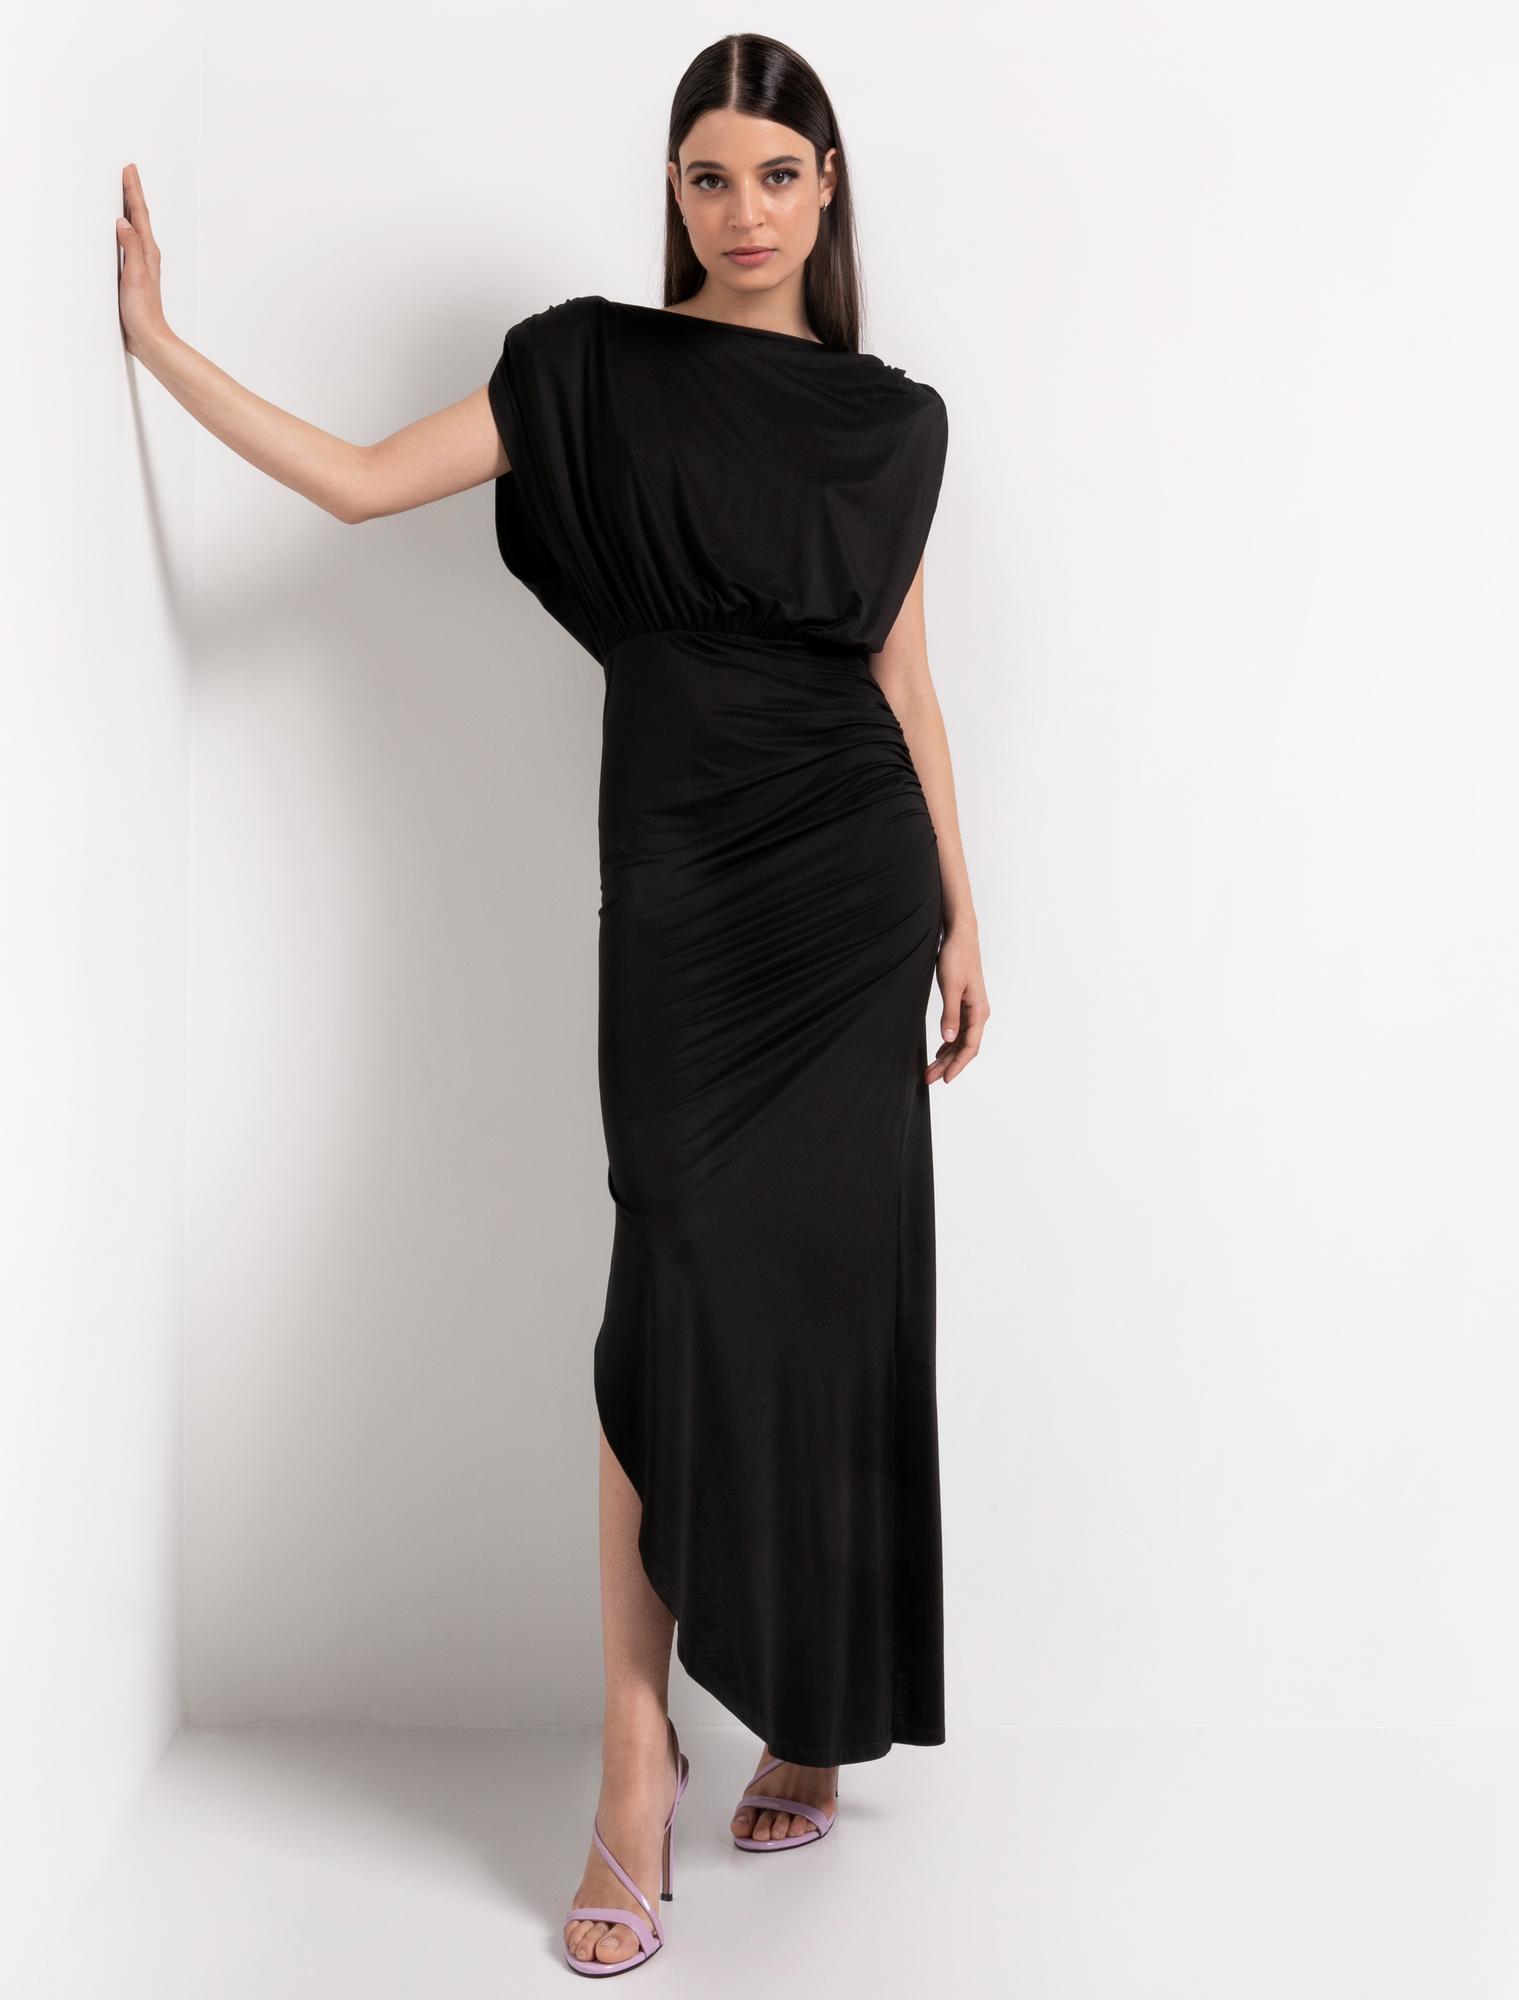 Maxi φόρεμα με ανοιχτή πλάτη - ΜΑΥΡΟ